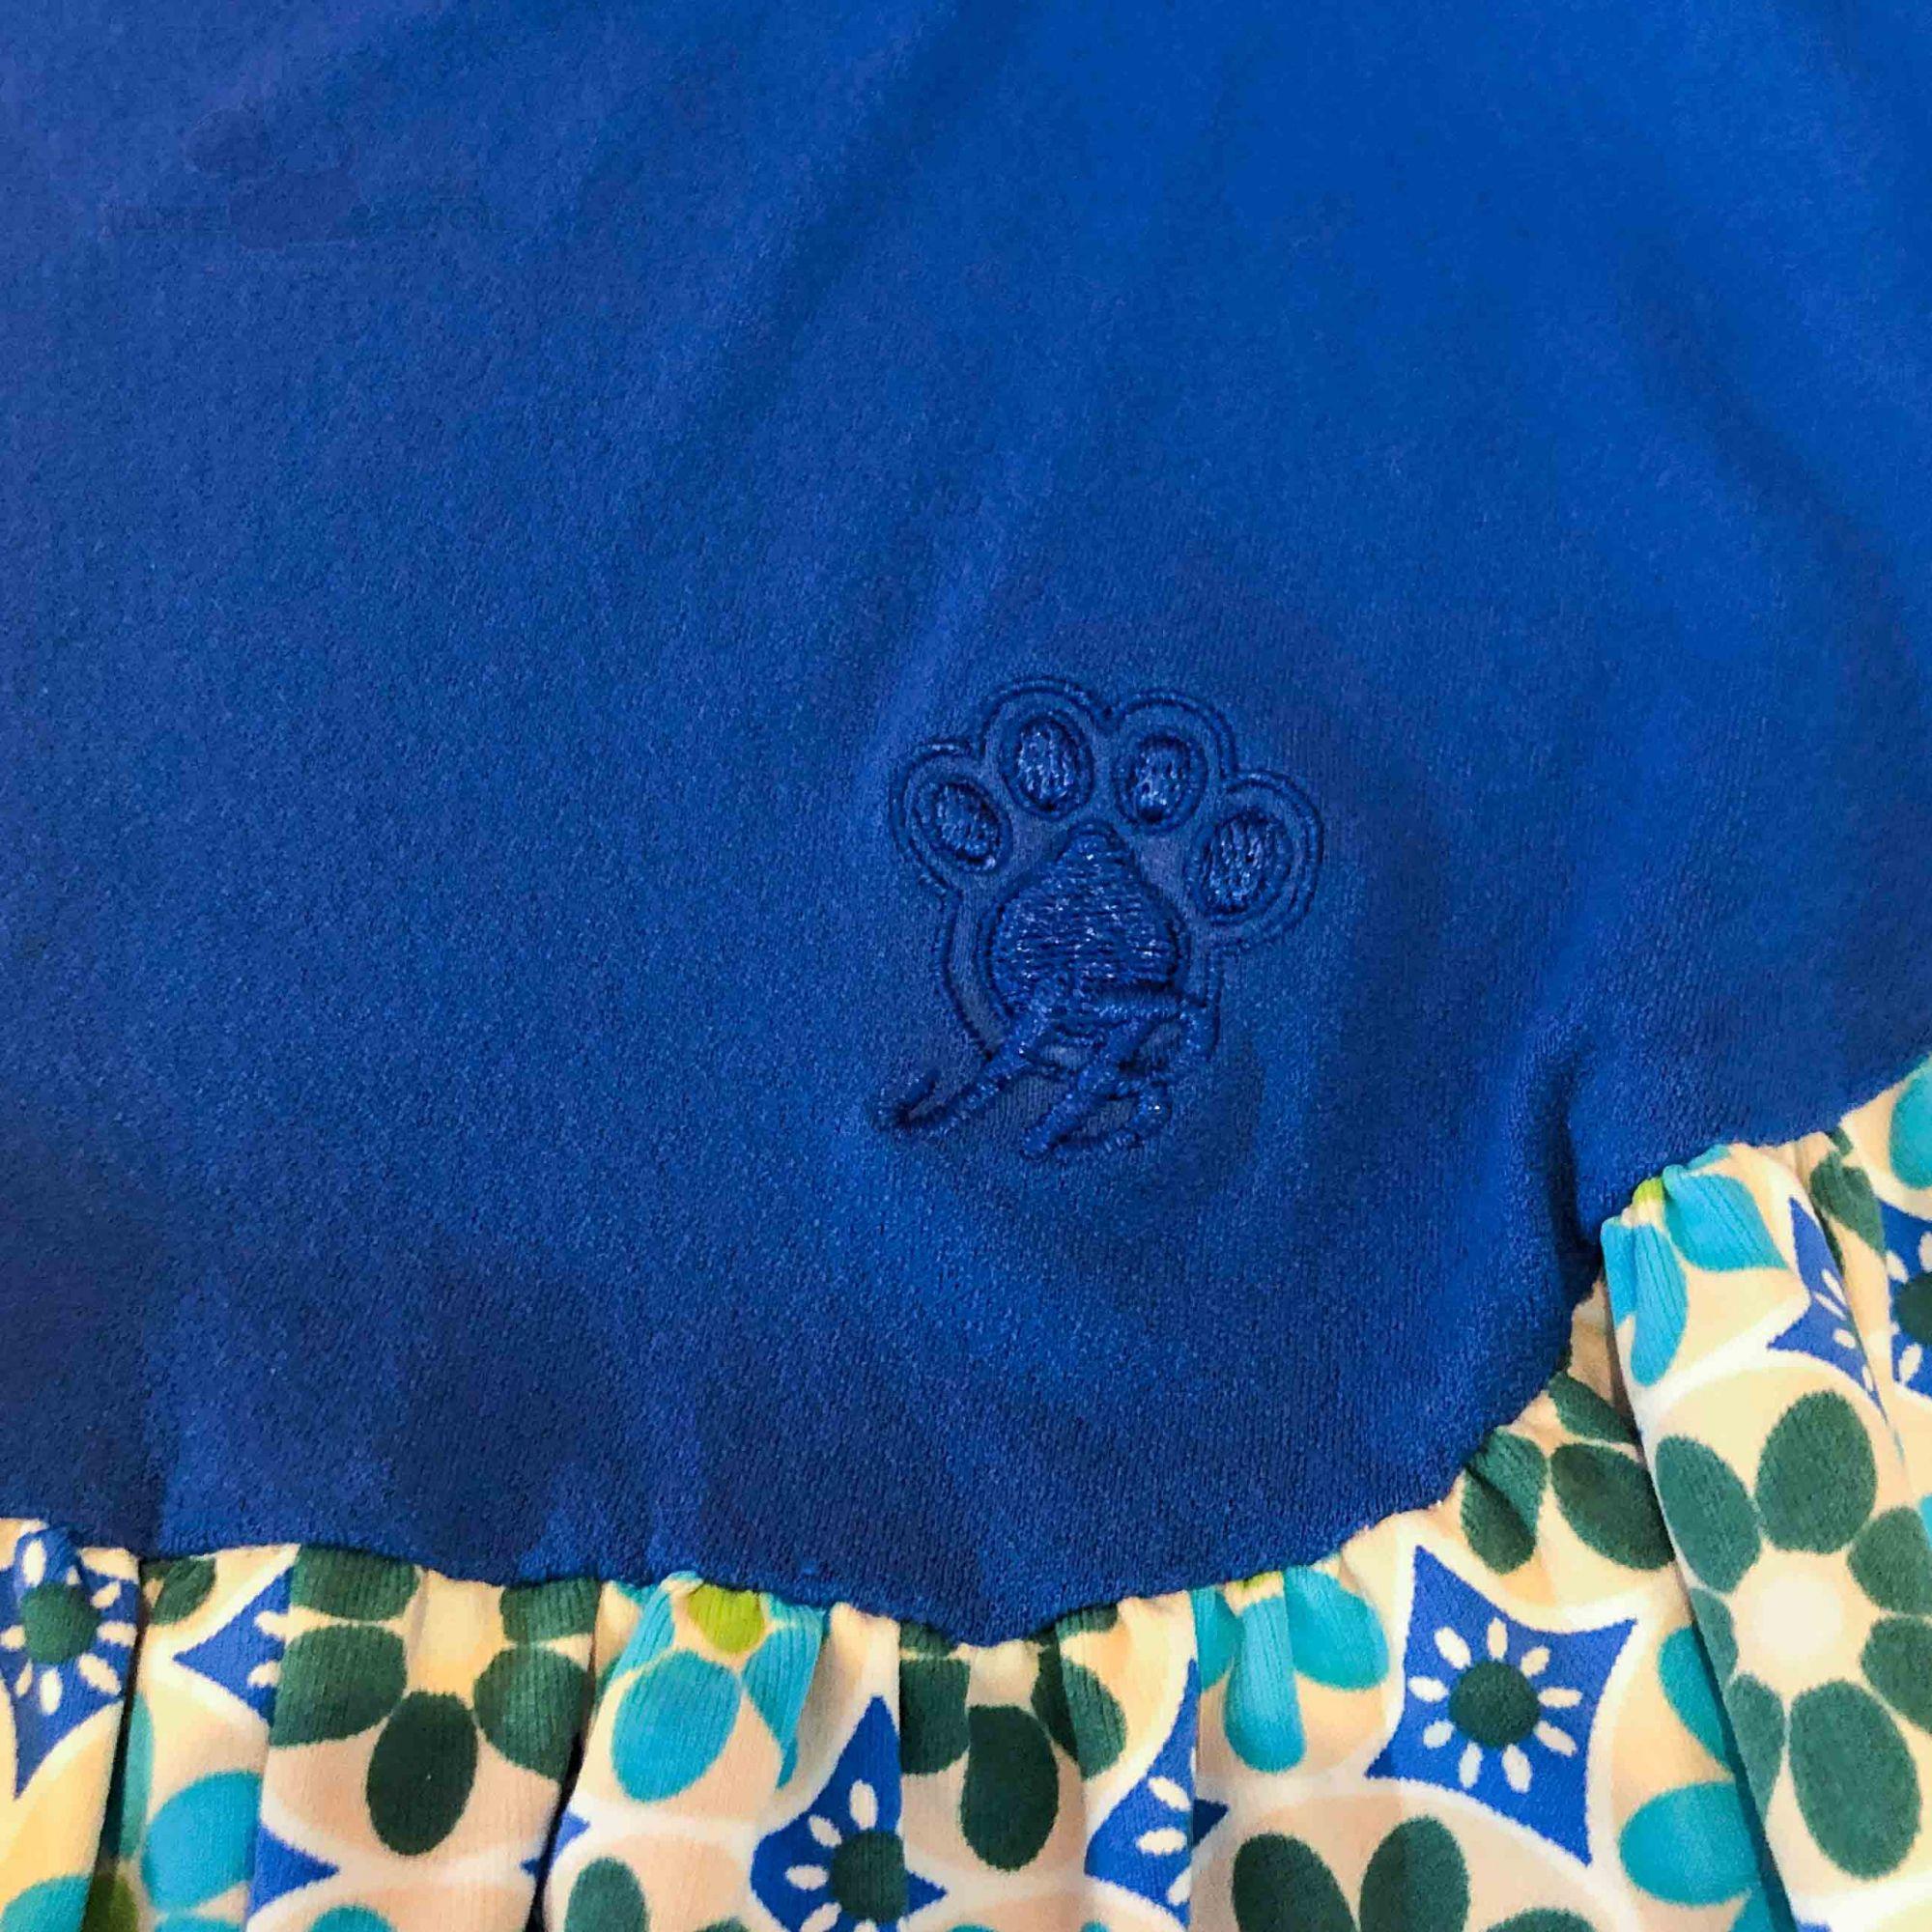 Vestido DryFit Azul Estampado  e Patch